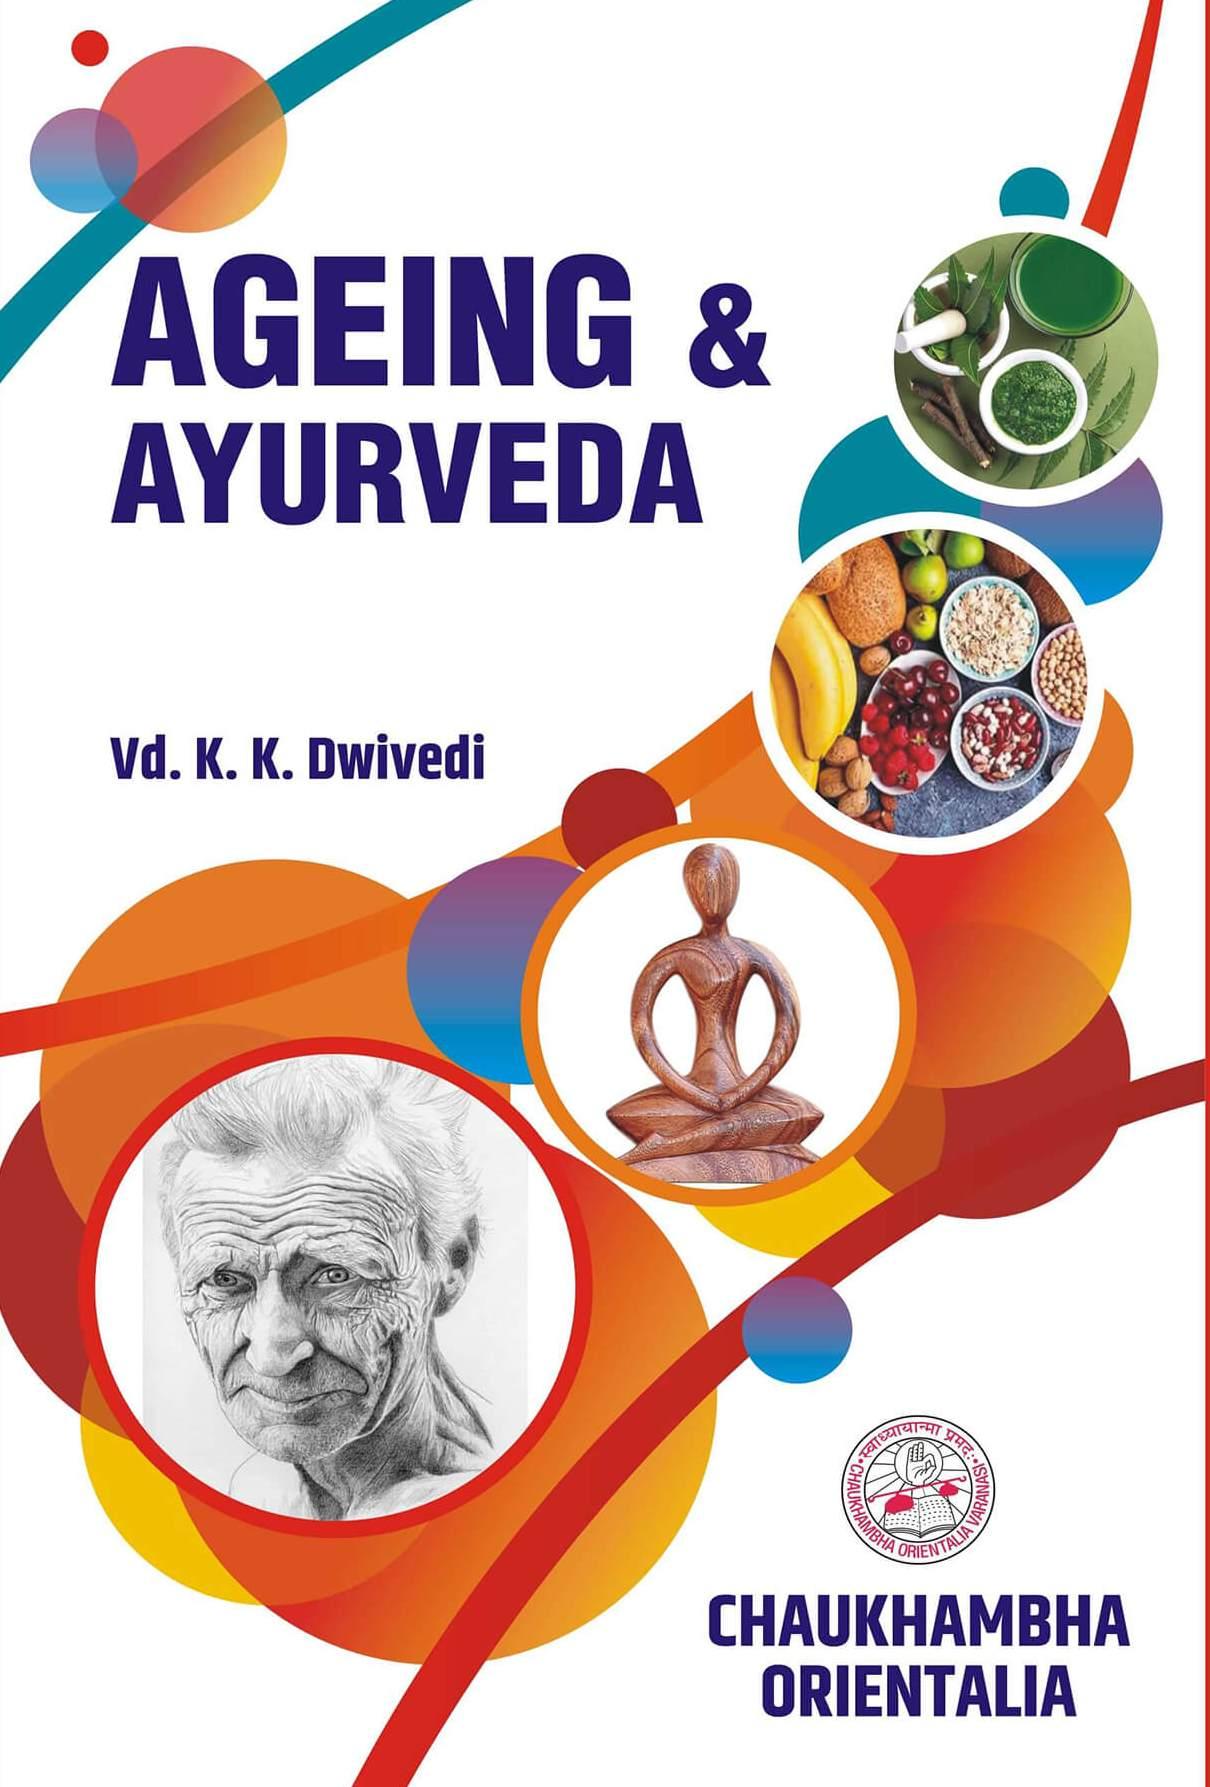 Ageing & Ayurveda